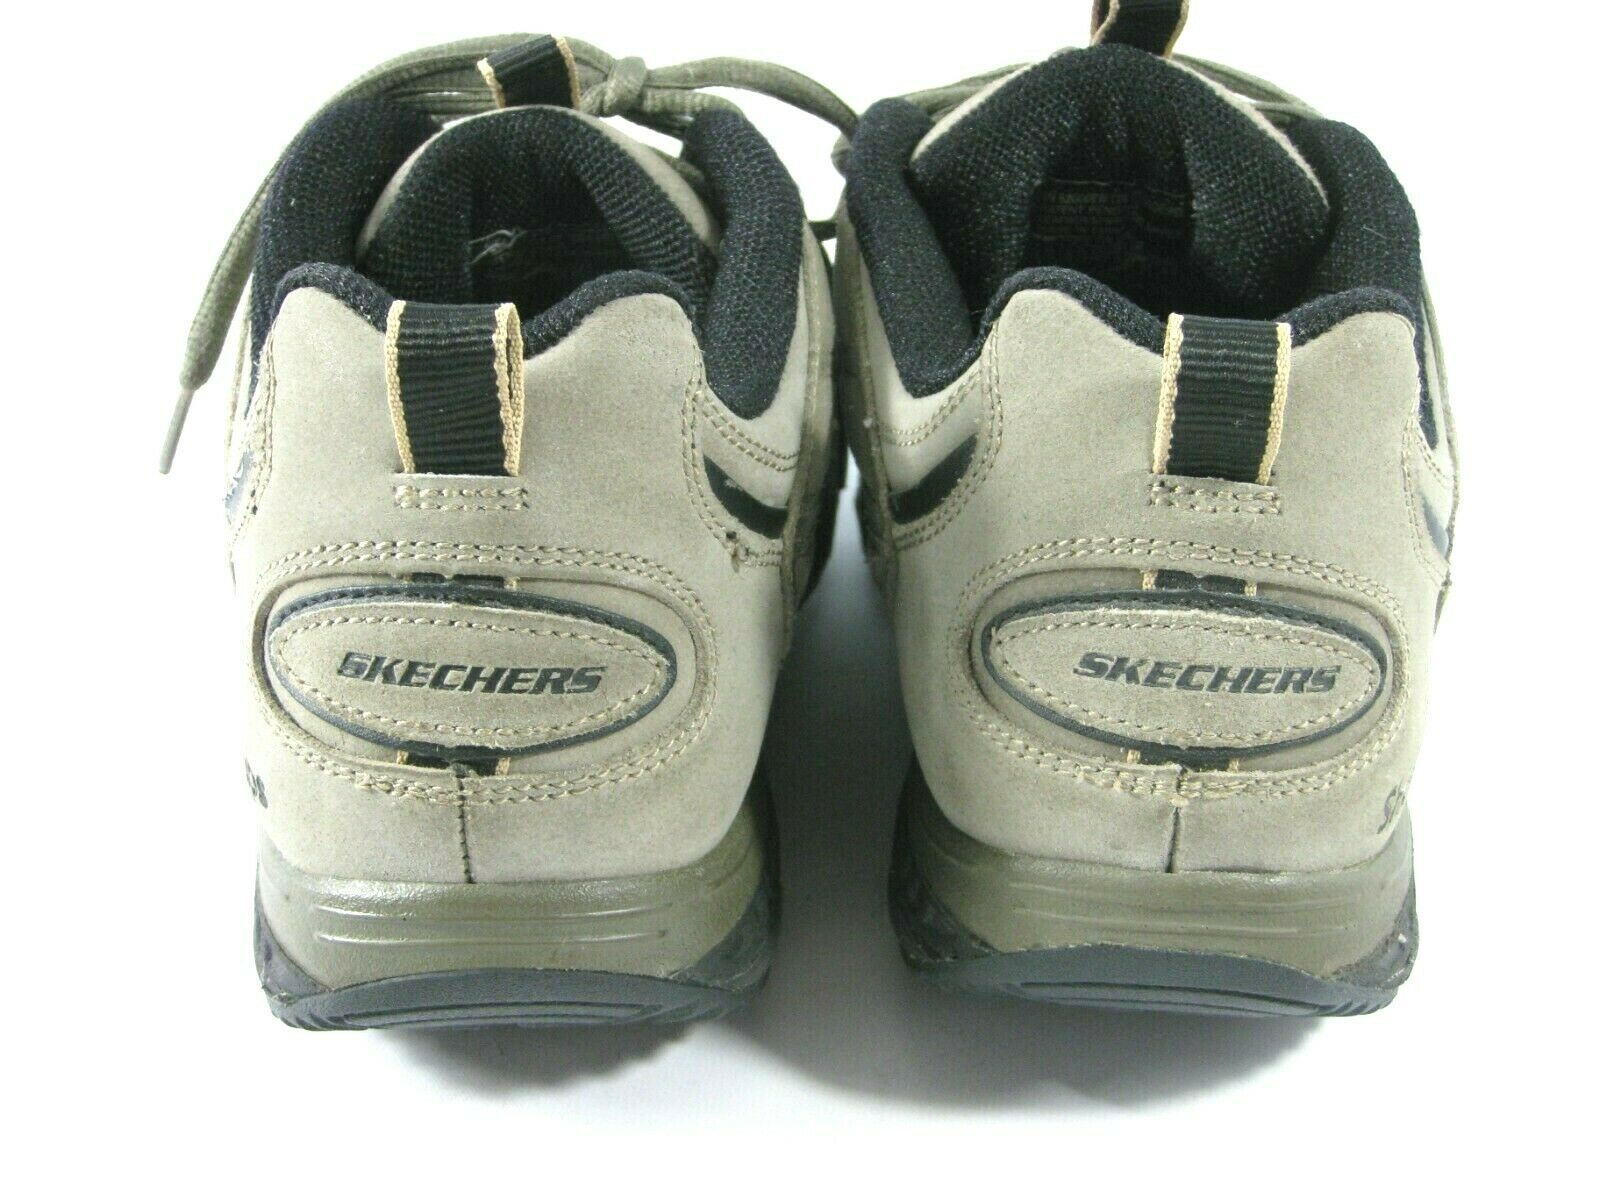 SKECHERS Shape Ups XT 52000EW Mens Athletic Walking Sneakers Shoes Size 9.5 PBL image 5